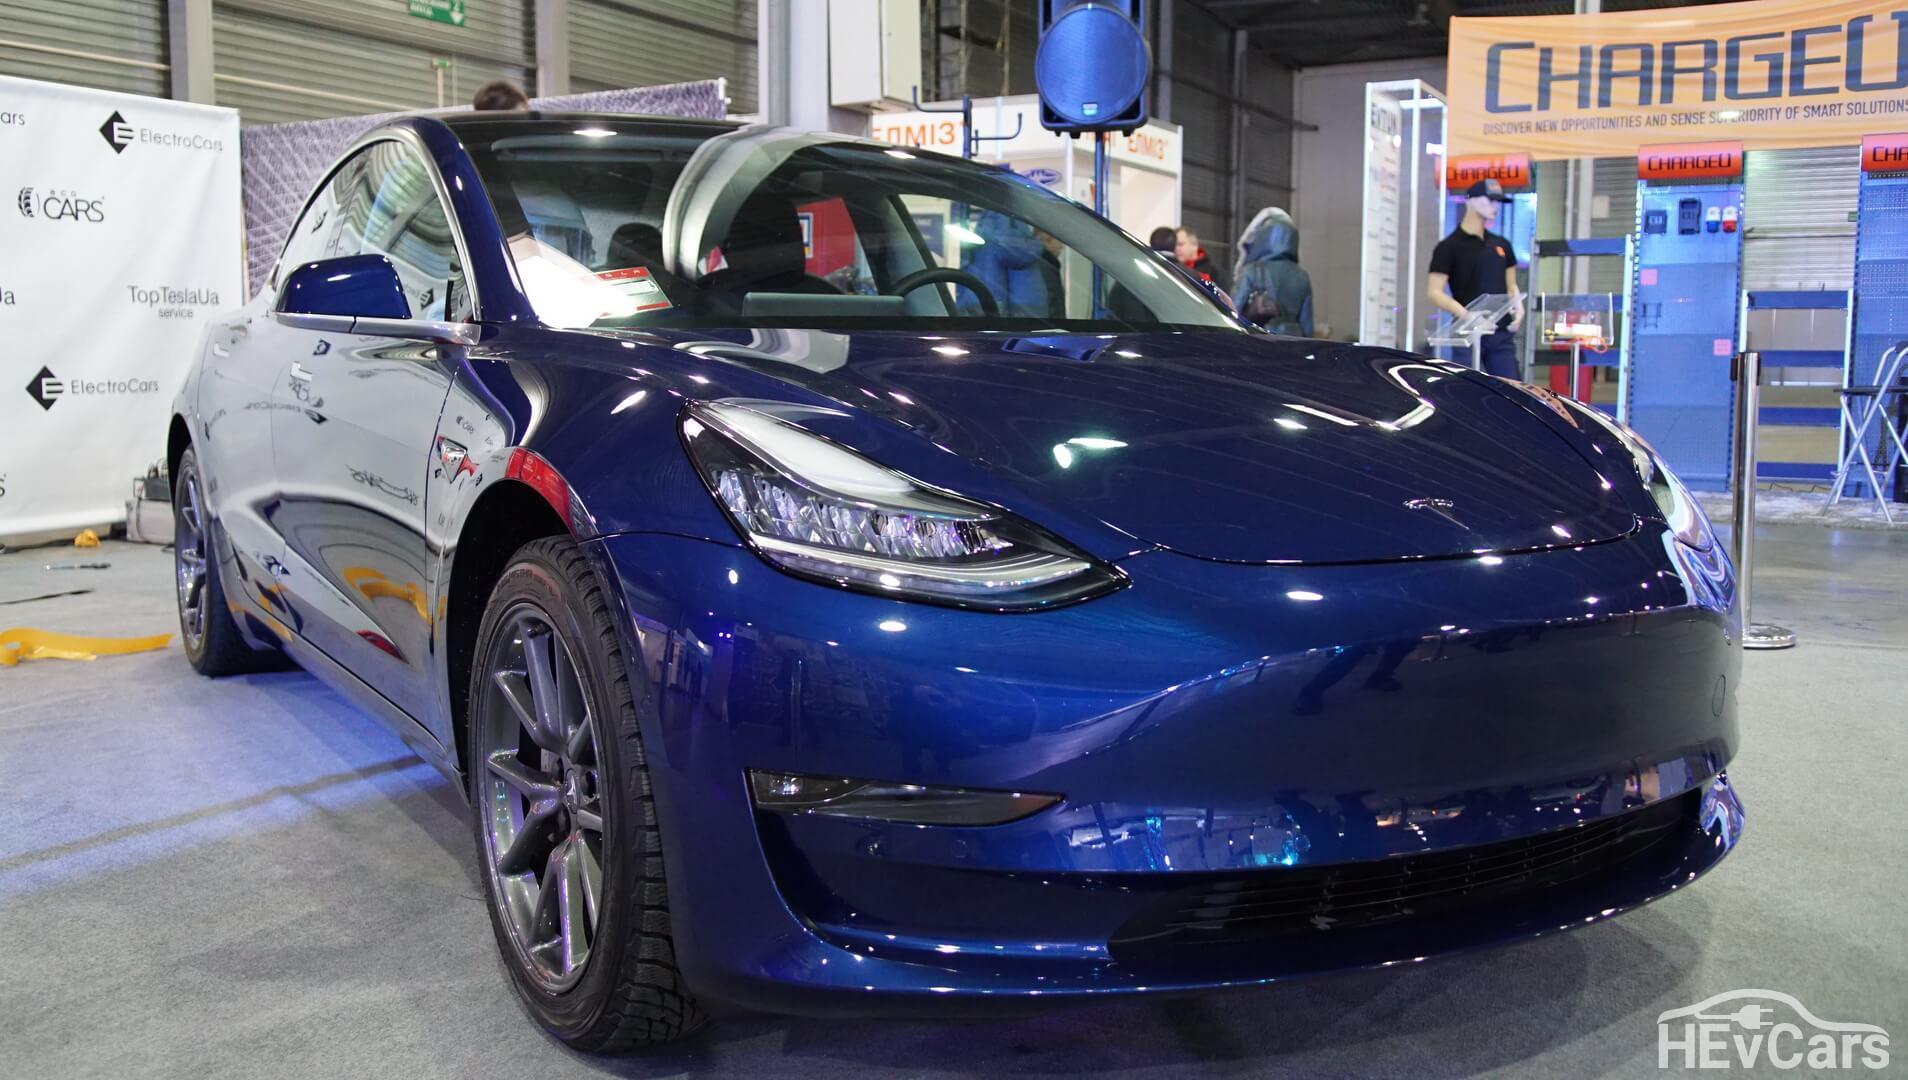 «Звезда» выставки Plug-In Ukraine 2018 — Tesla Model 3